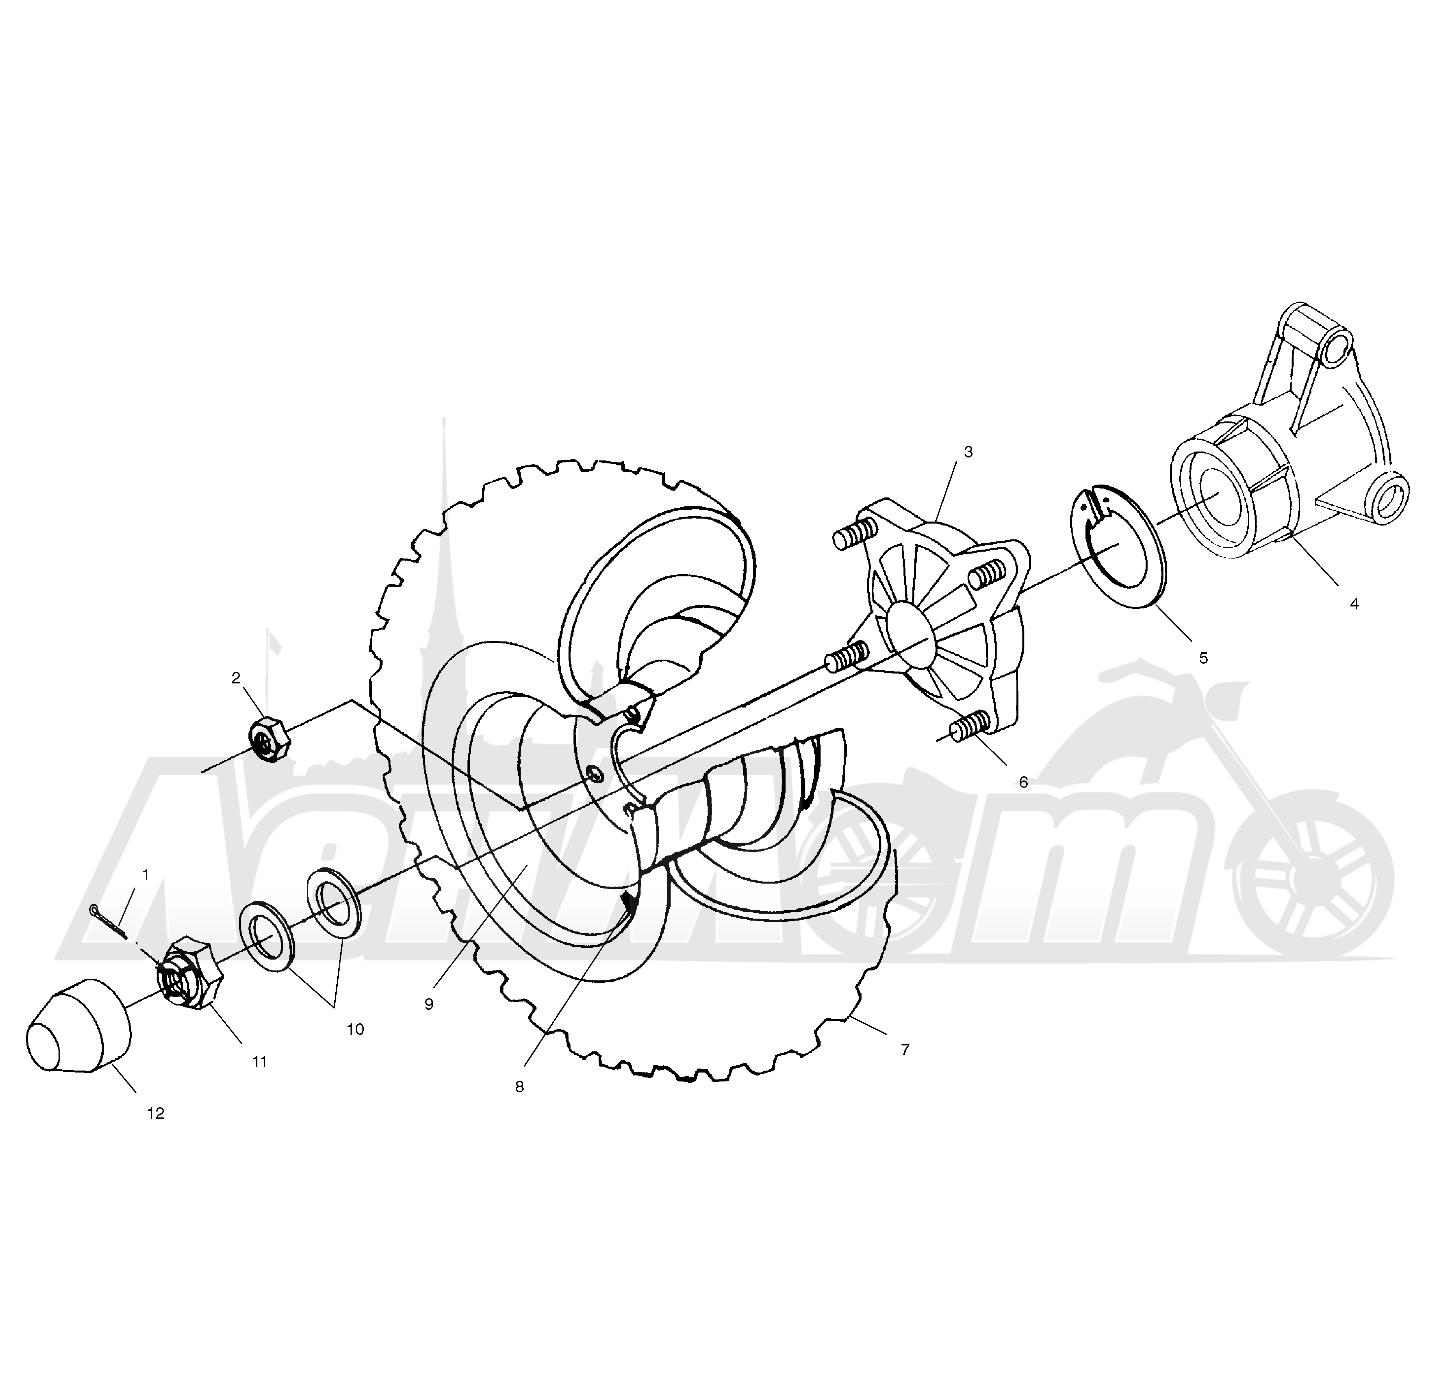 Запчасти для Квадроцикла Polaris 1997 SPORTSMAN 500 - W97CH50A Раздел: REAR WHEEL DRIVE - W97CH50A   заднее колесо привод W97CH50A